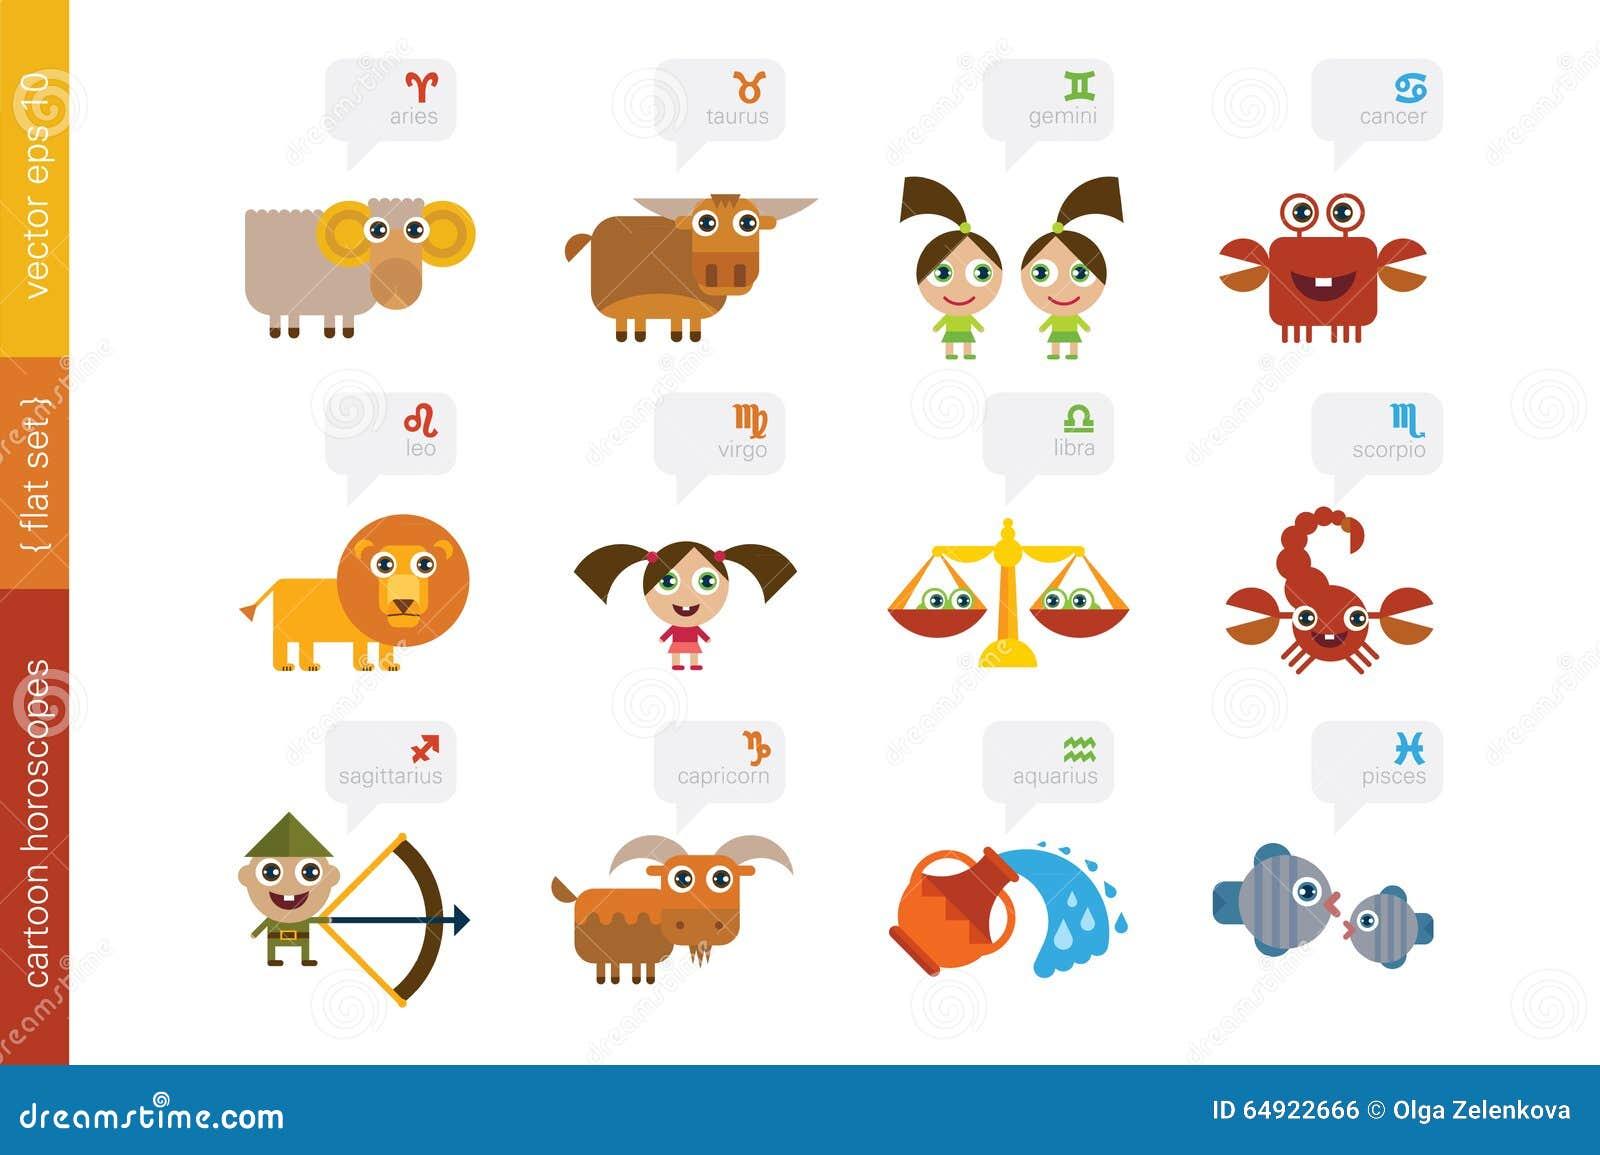 Zodiac signs cute cartoon characters stock vector illustration cartoon signs of zodiac royalty free stock image buycottarizona Images